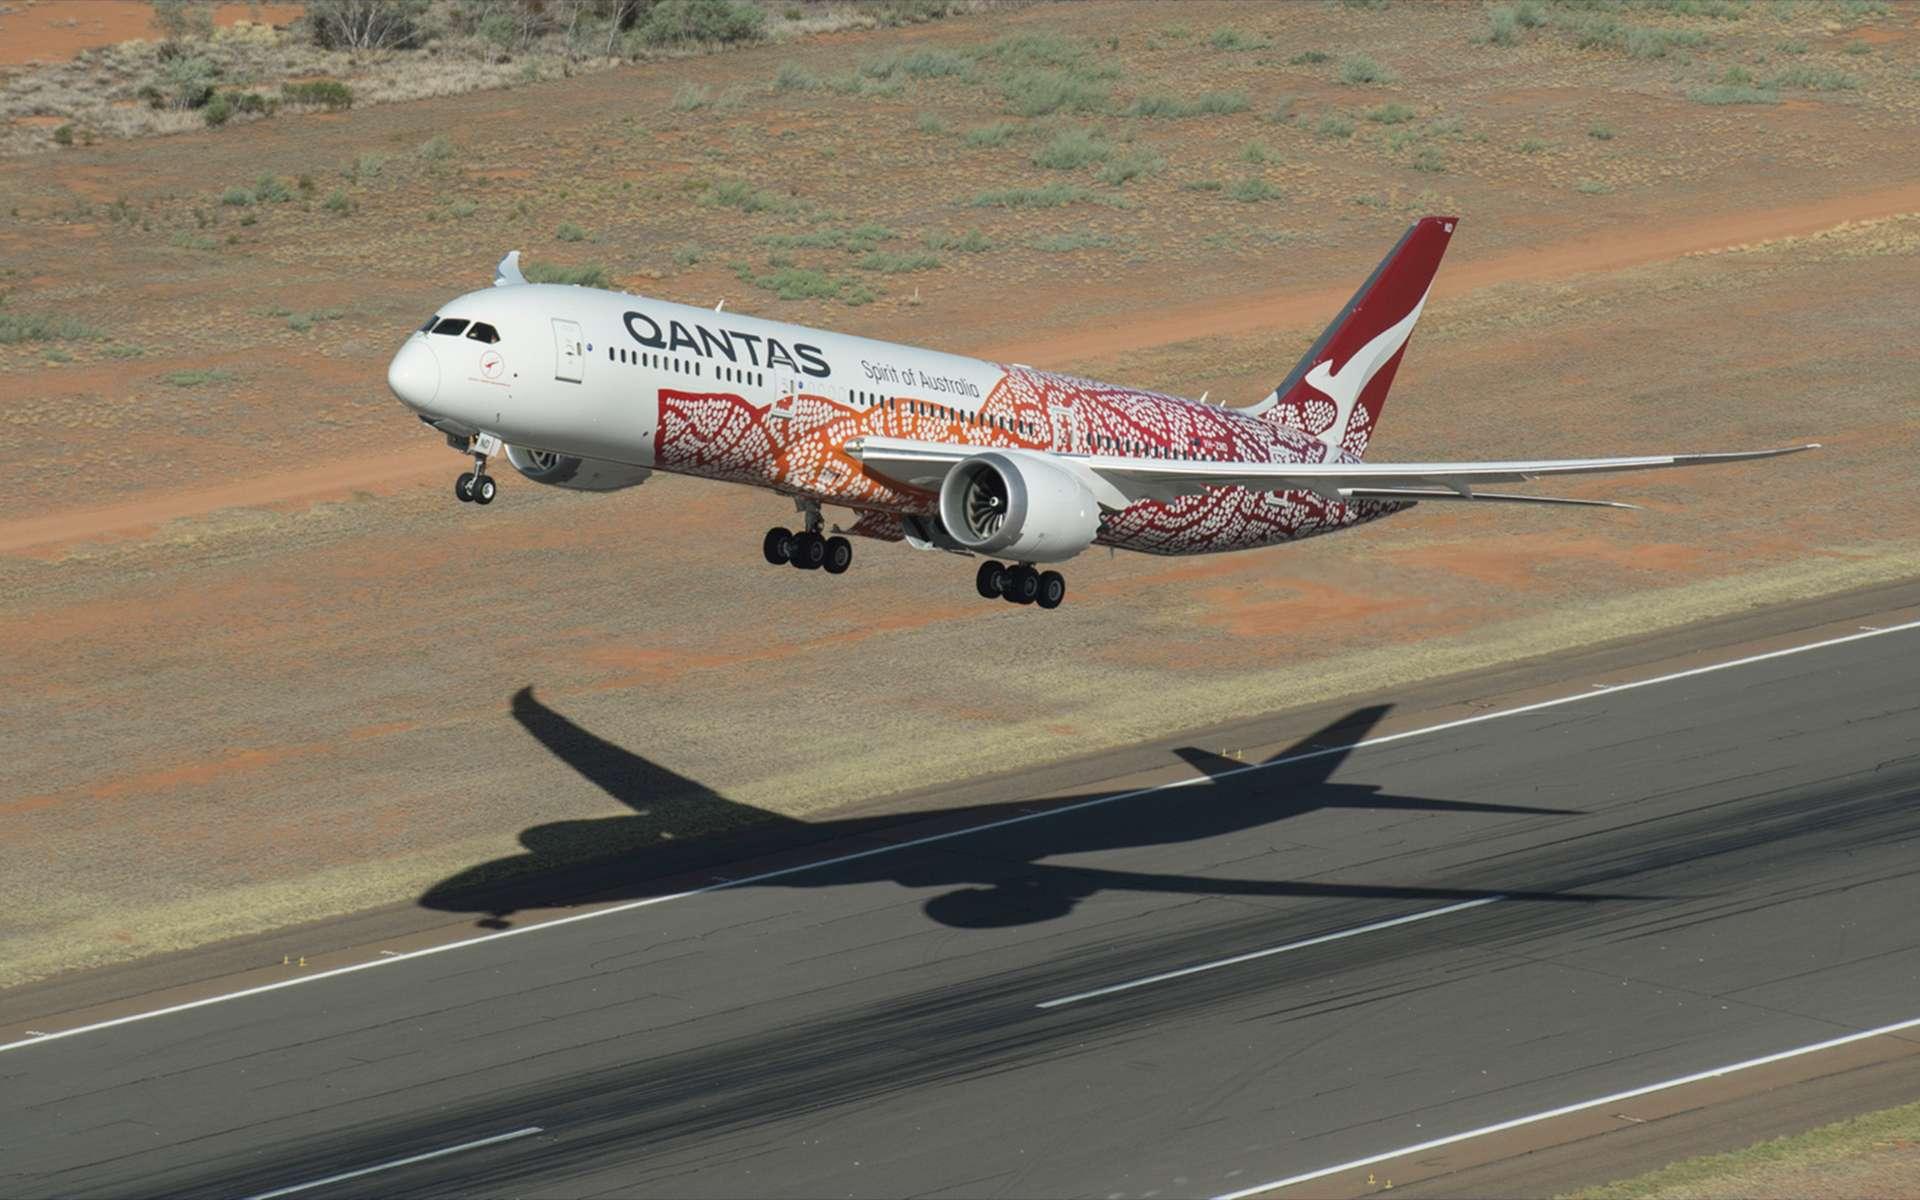 Carte Vol Qantas Australie.Qantas Va Tester Le Premier Vol Direct New York Sydney D Une